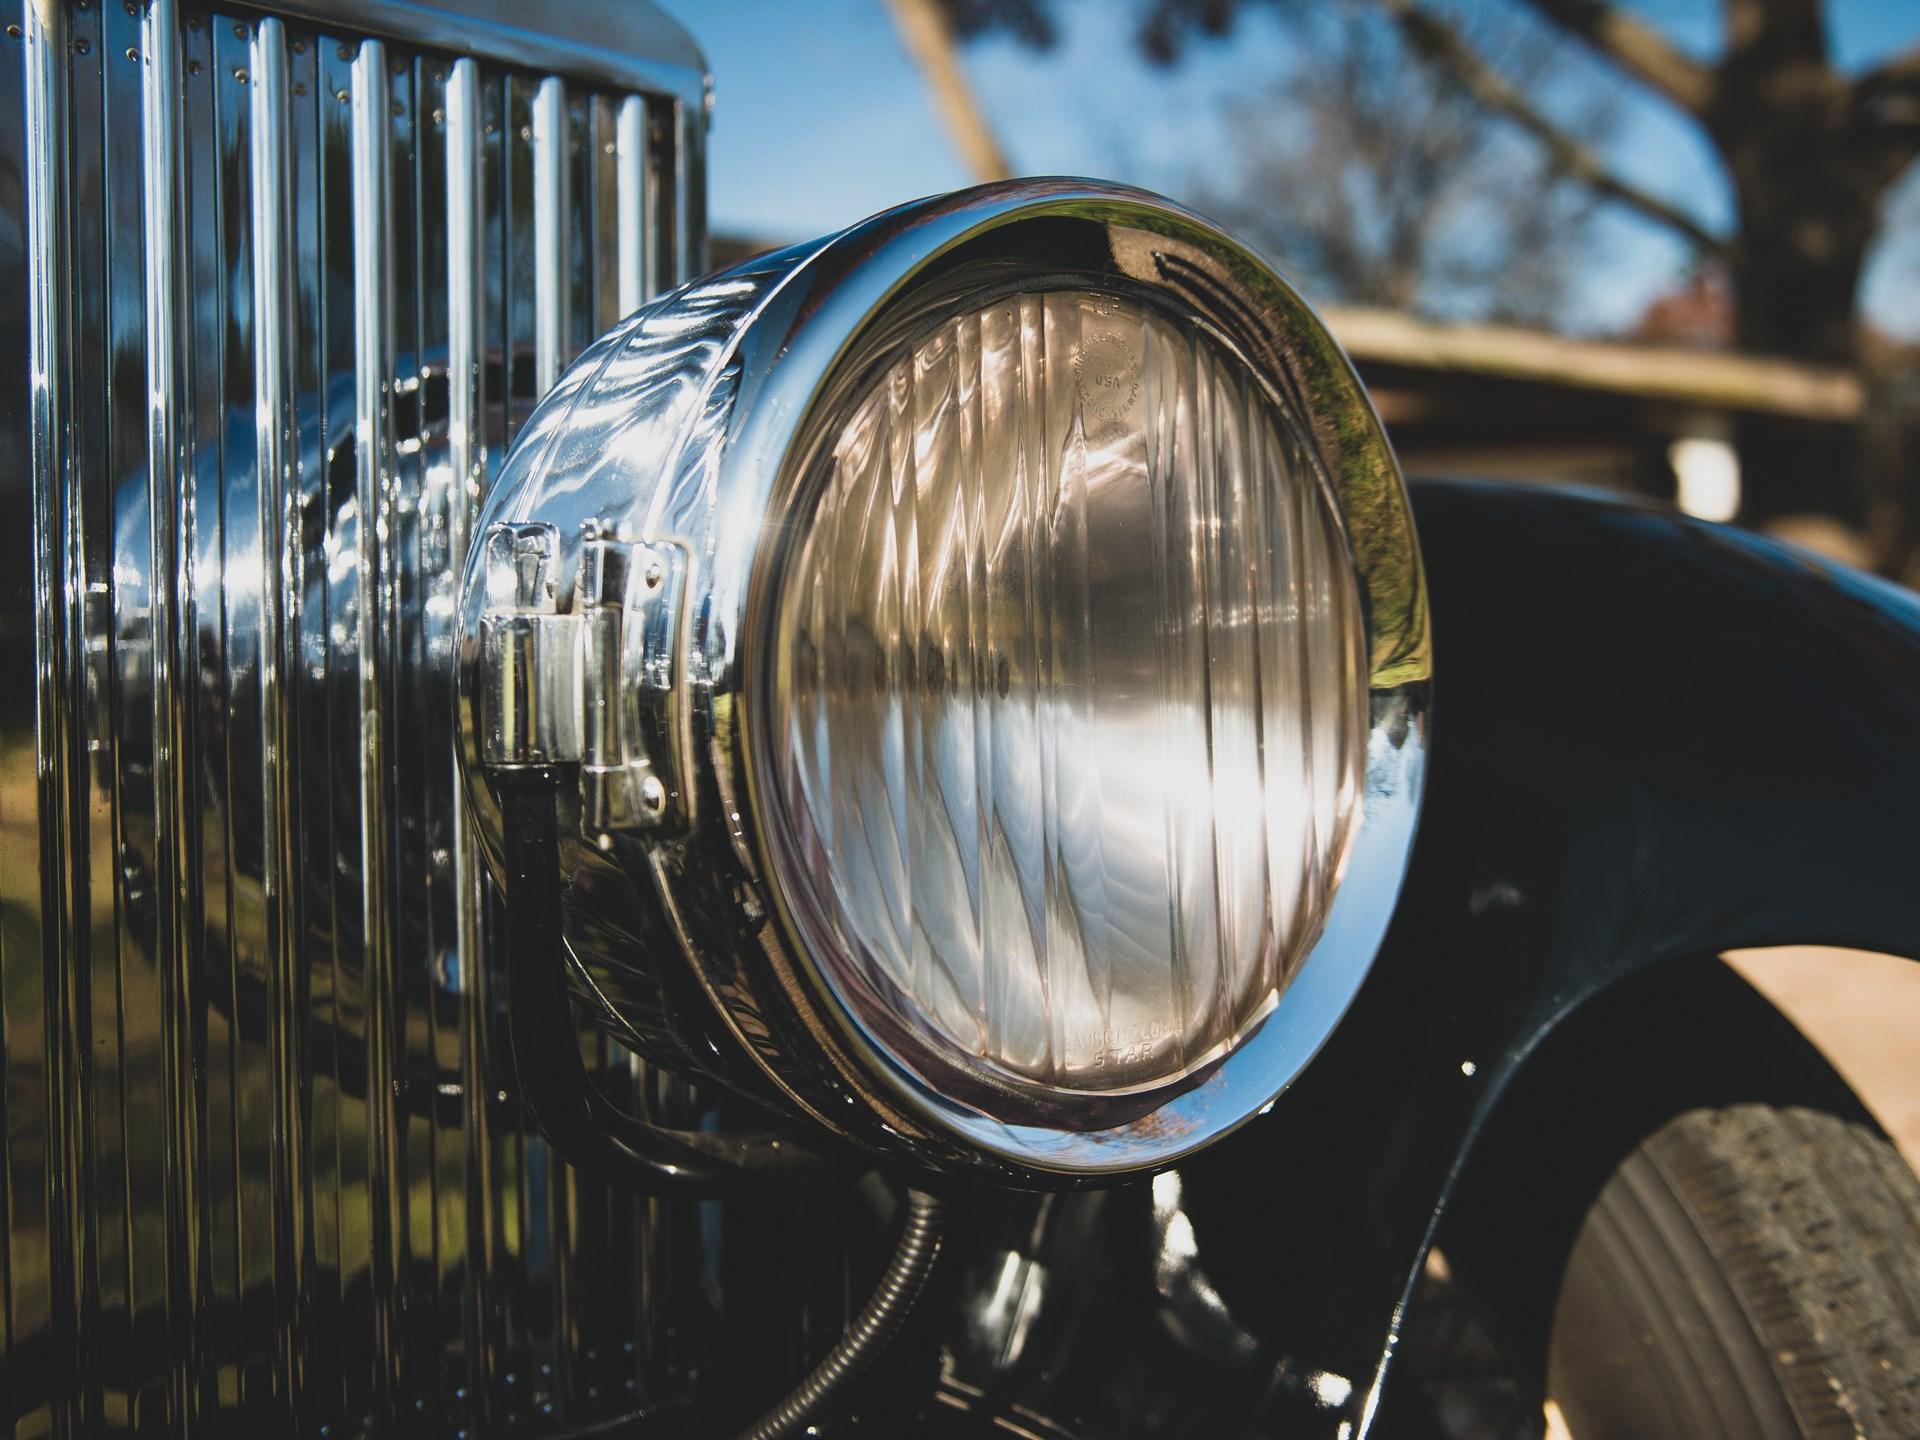 1928 Rolls-Royce Phantom I St. Stephen Town Car Landaulette by Brewster